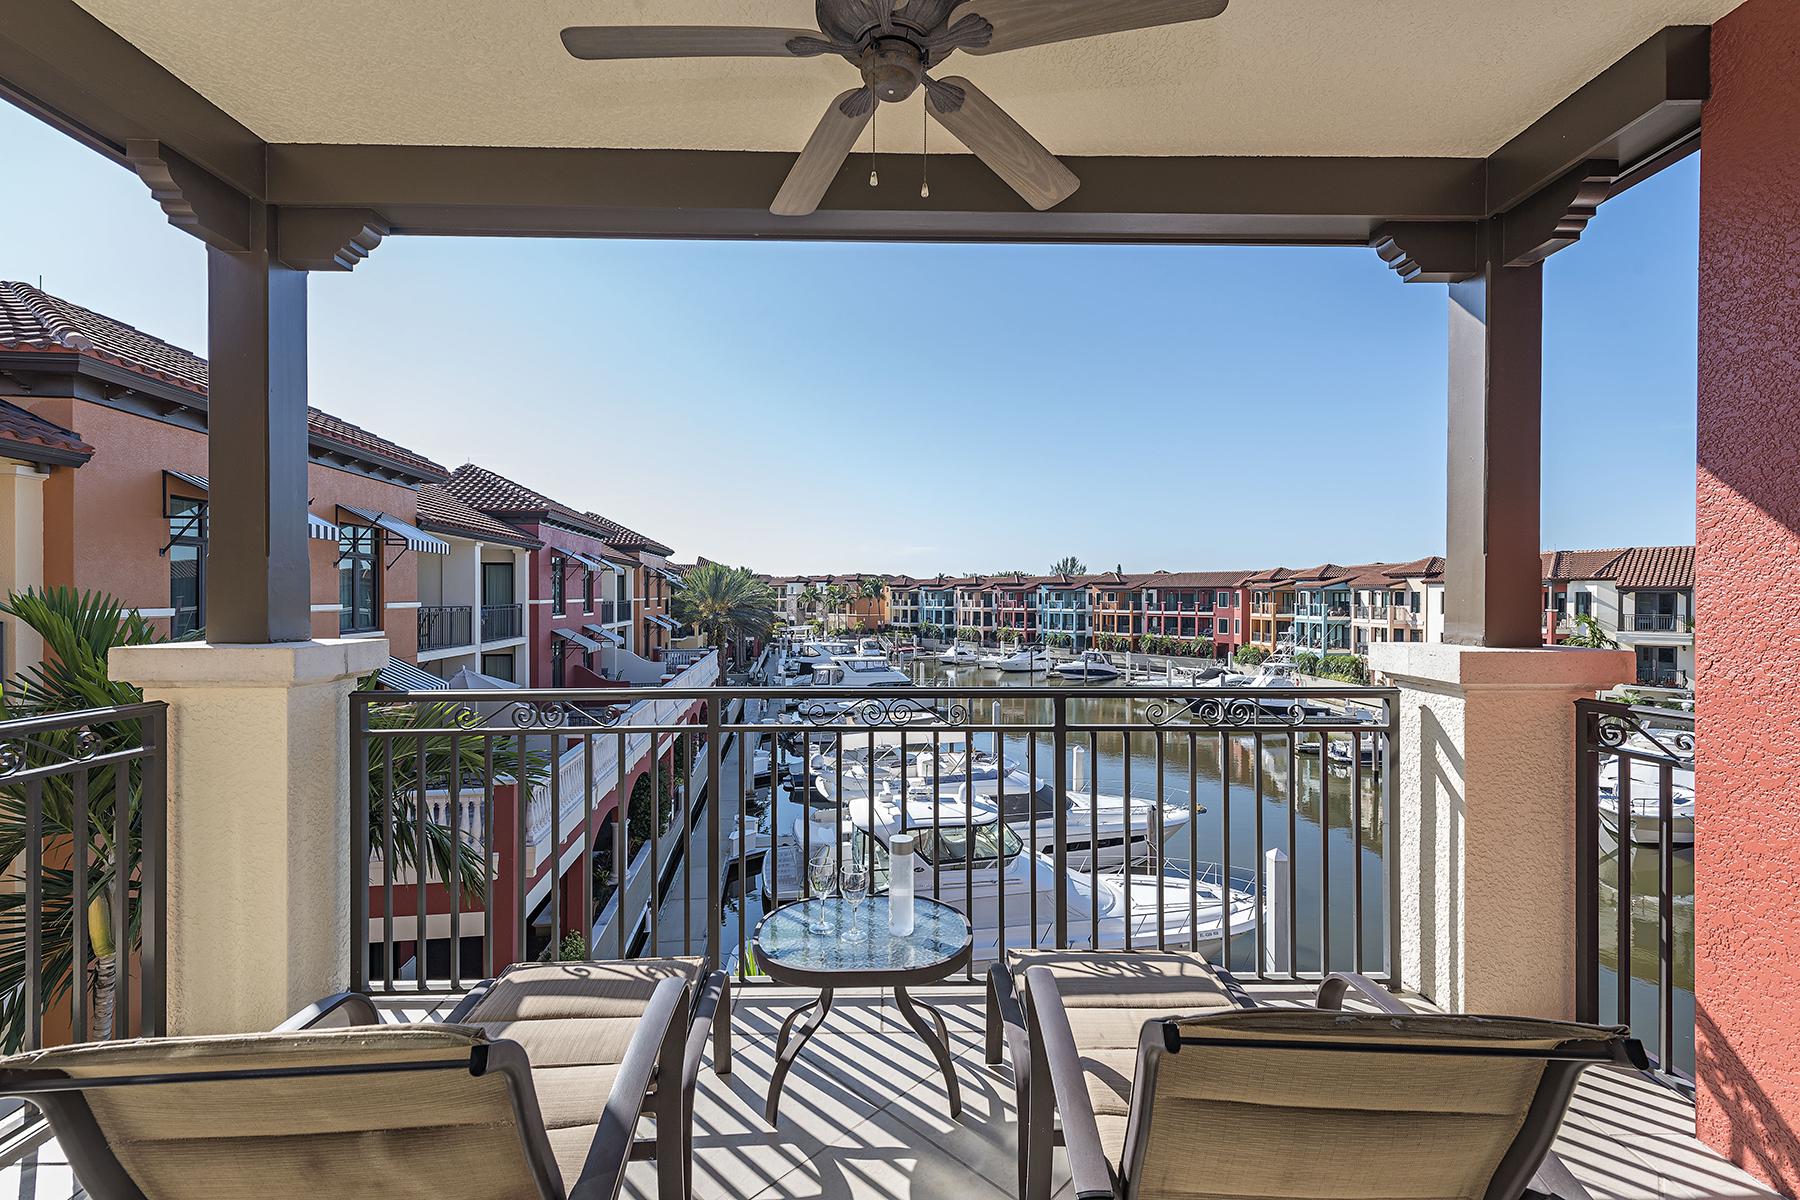 Condomínio para Venda às NAPLES BAY RESORT 1490 5th Ave S 1-302 & 304 Naples, Florida, 34102 Estados Unidos